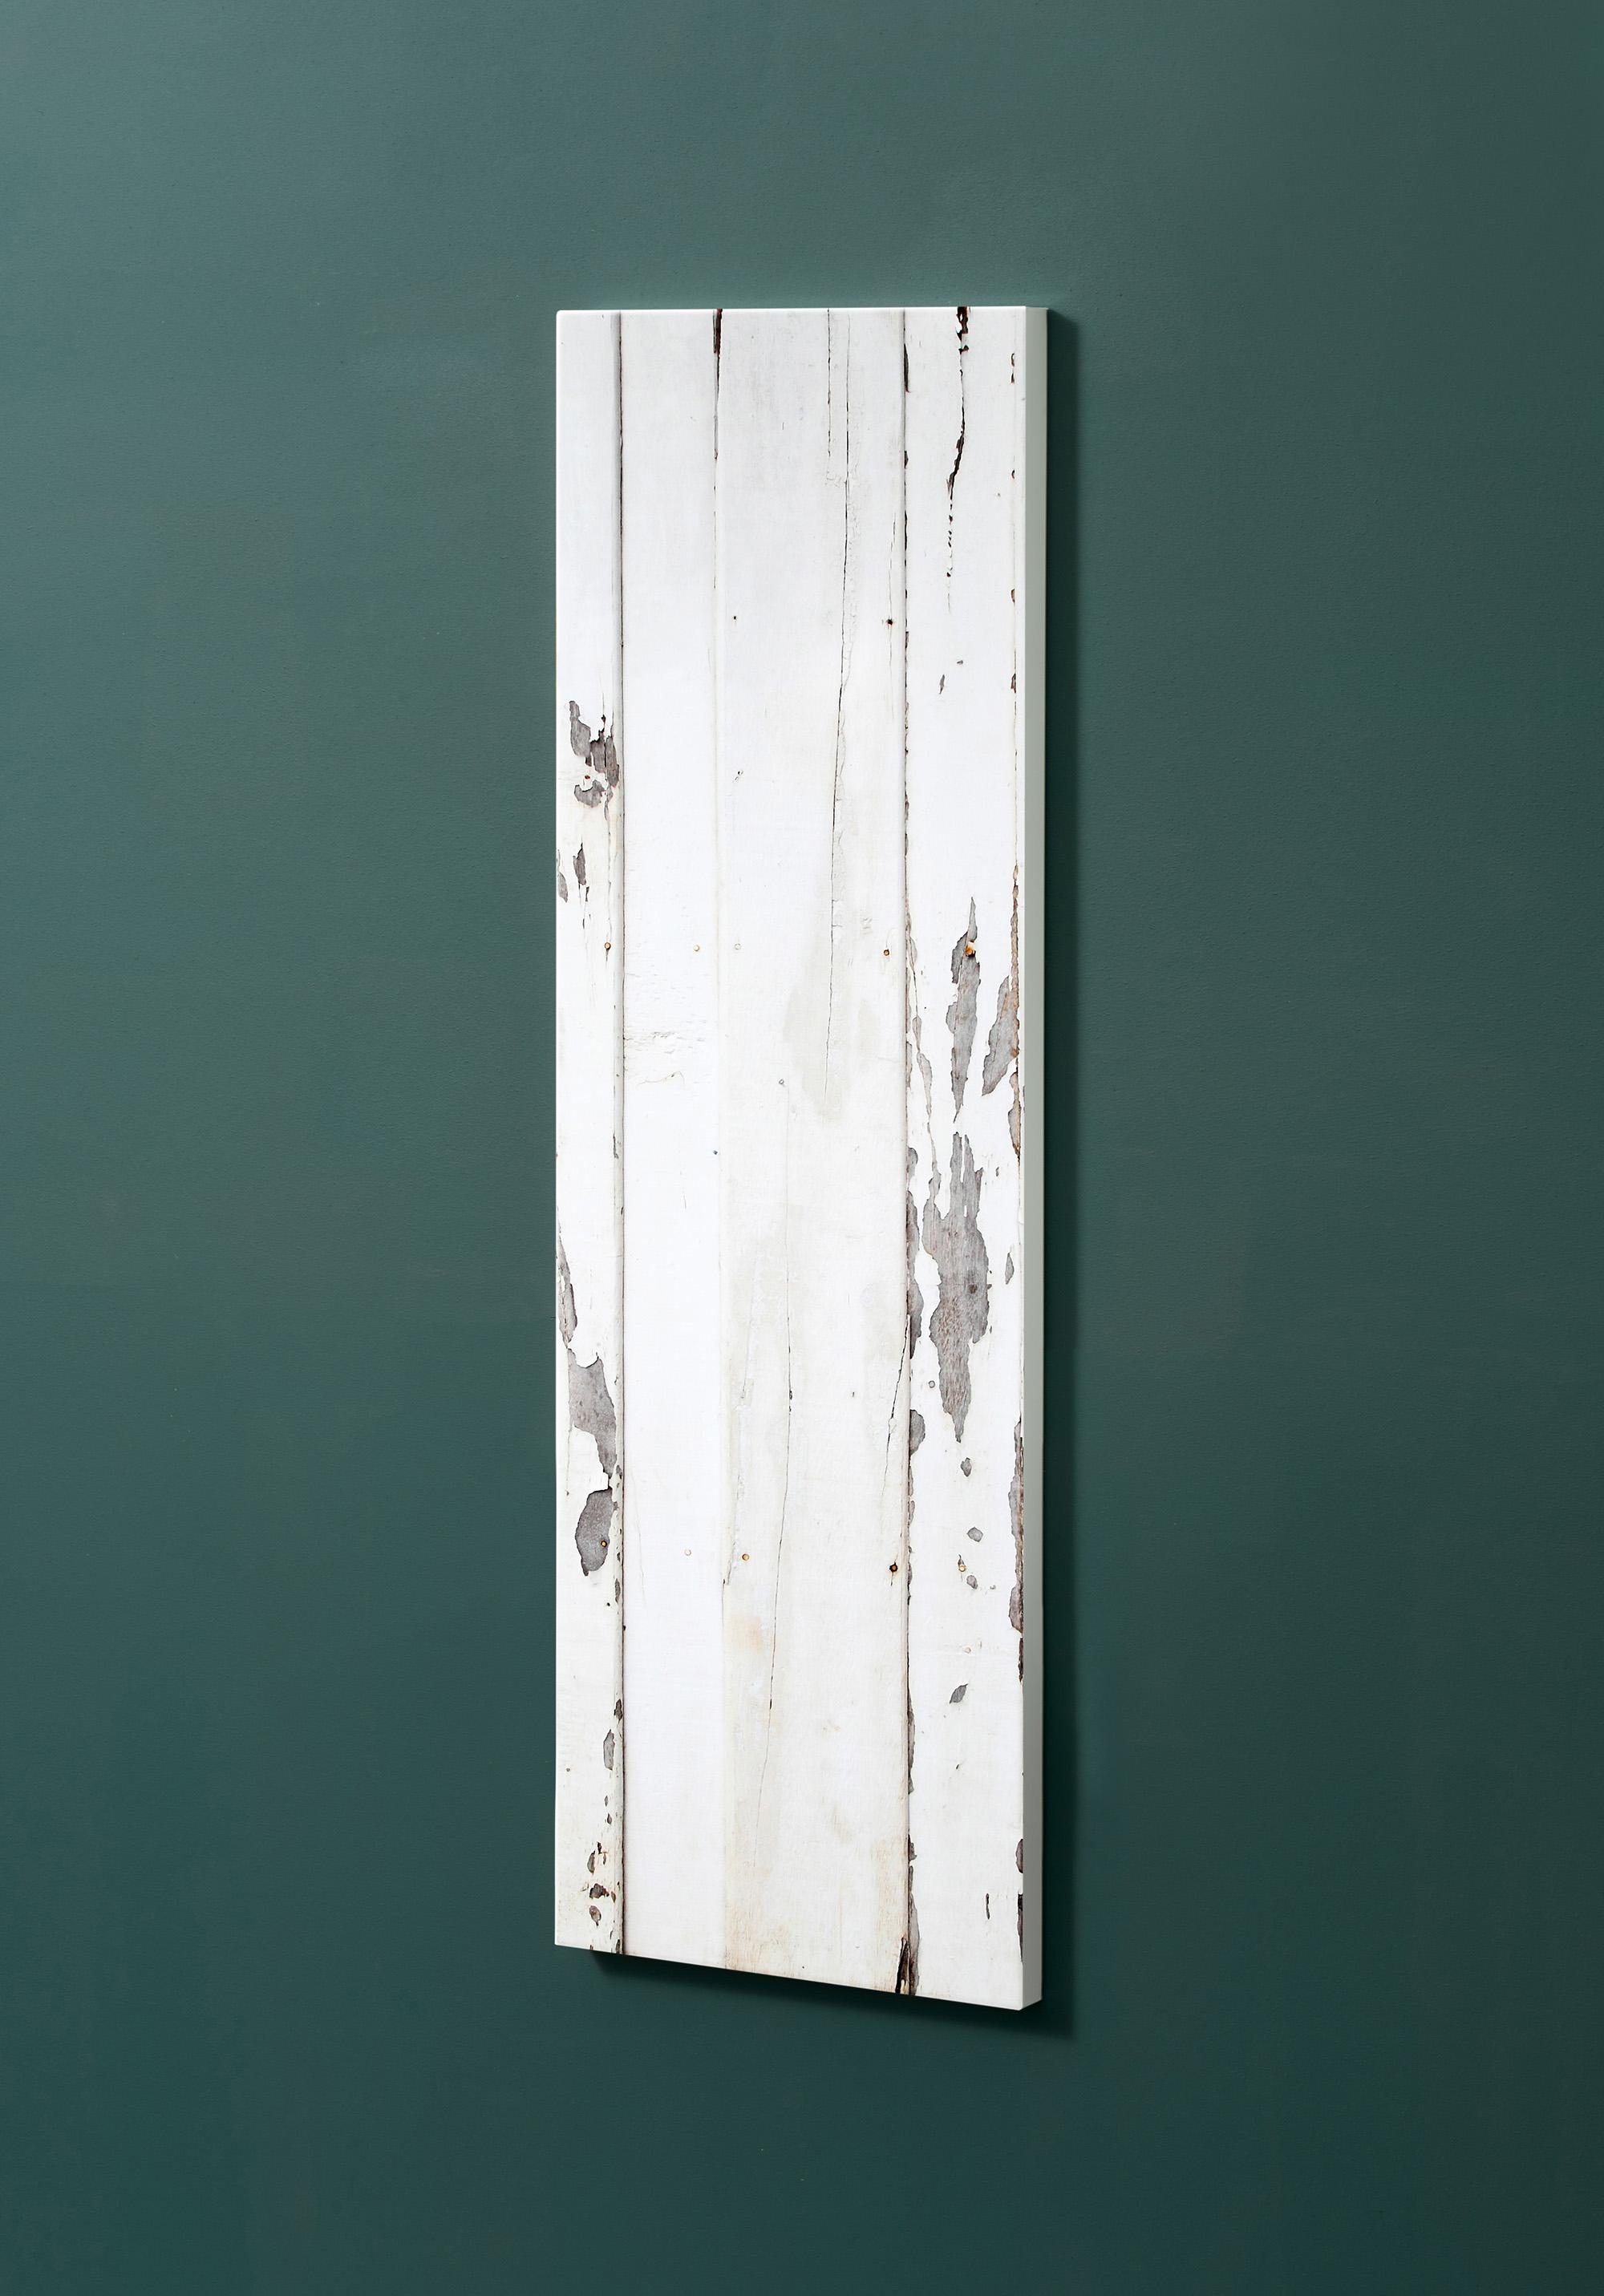 Magnettafel NOTIZ 30x90cm Motiv-Pinnwand M21 Holzbretter Vintage